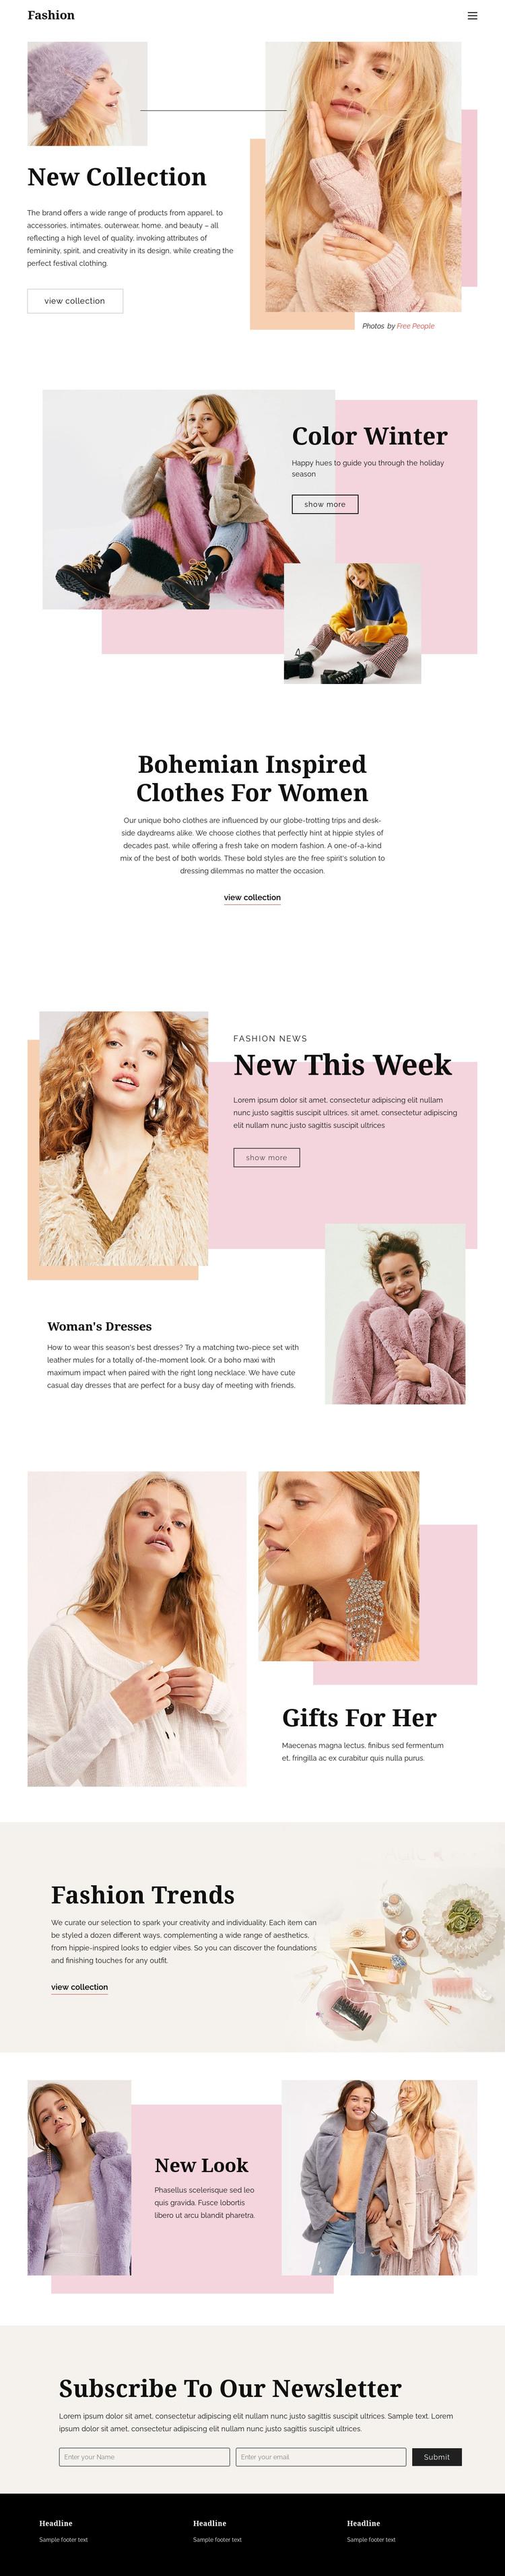 Fashion Page Design HTML Template